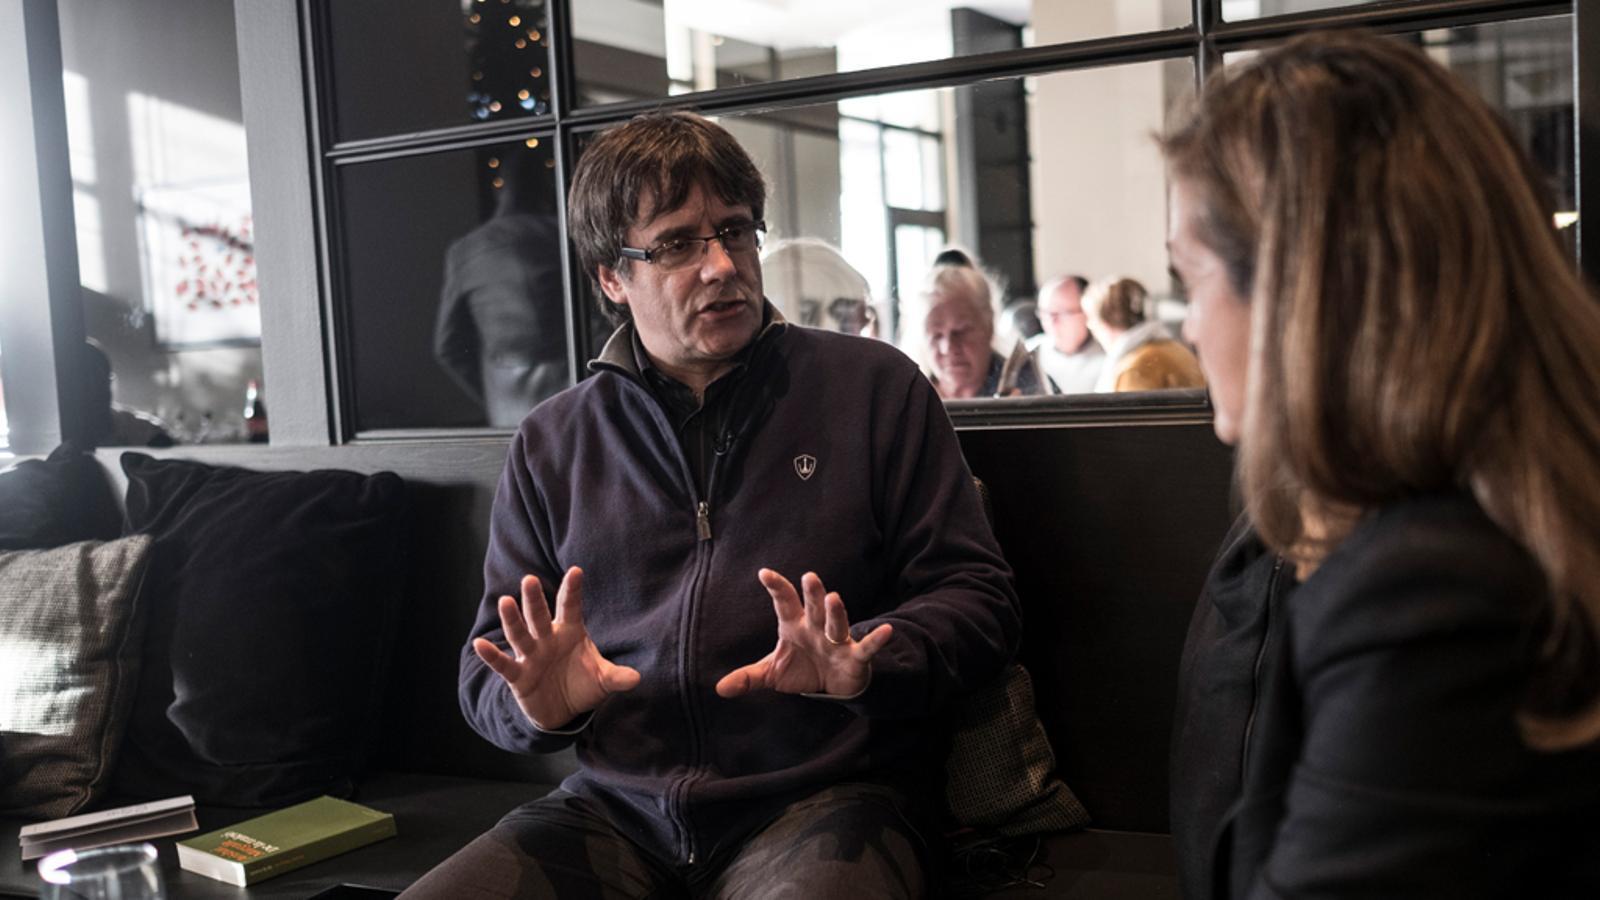 Entrevista d'Esther Vera a Carles Puigdemont